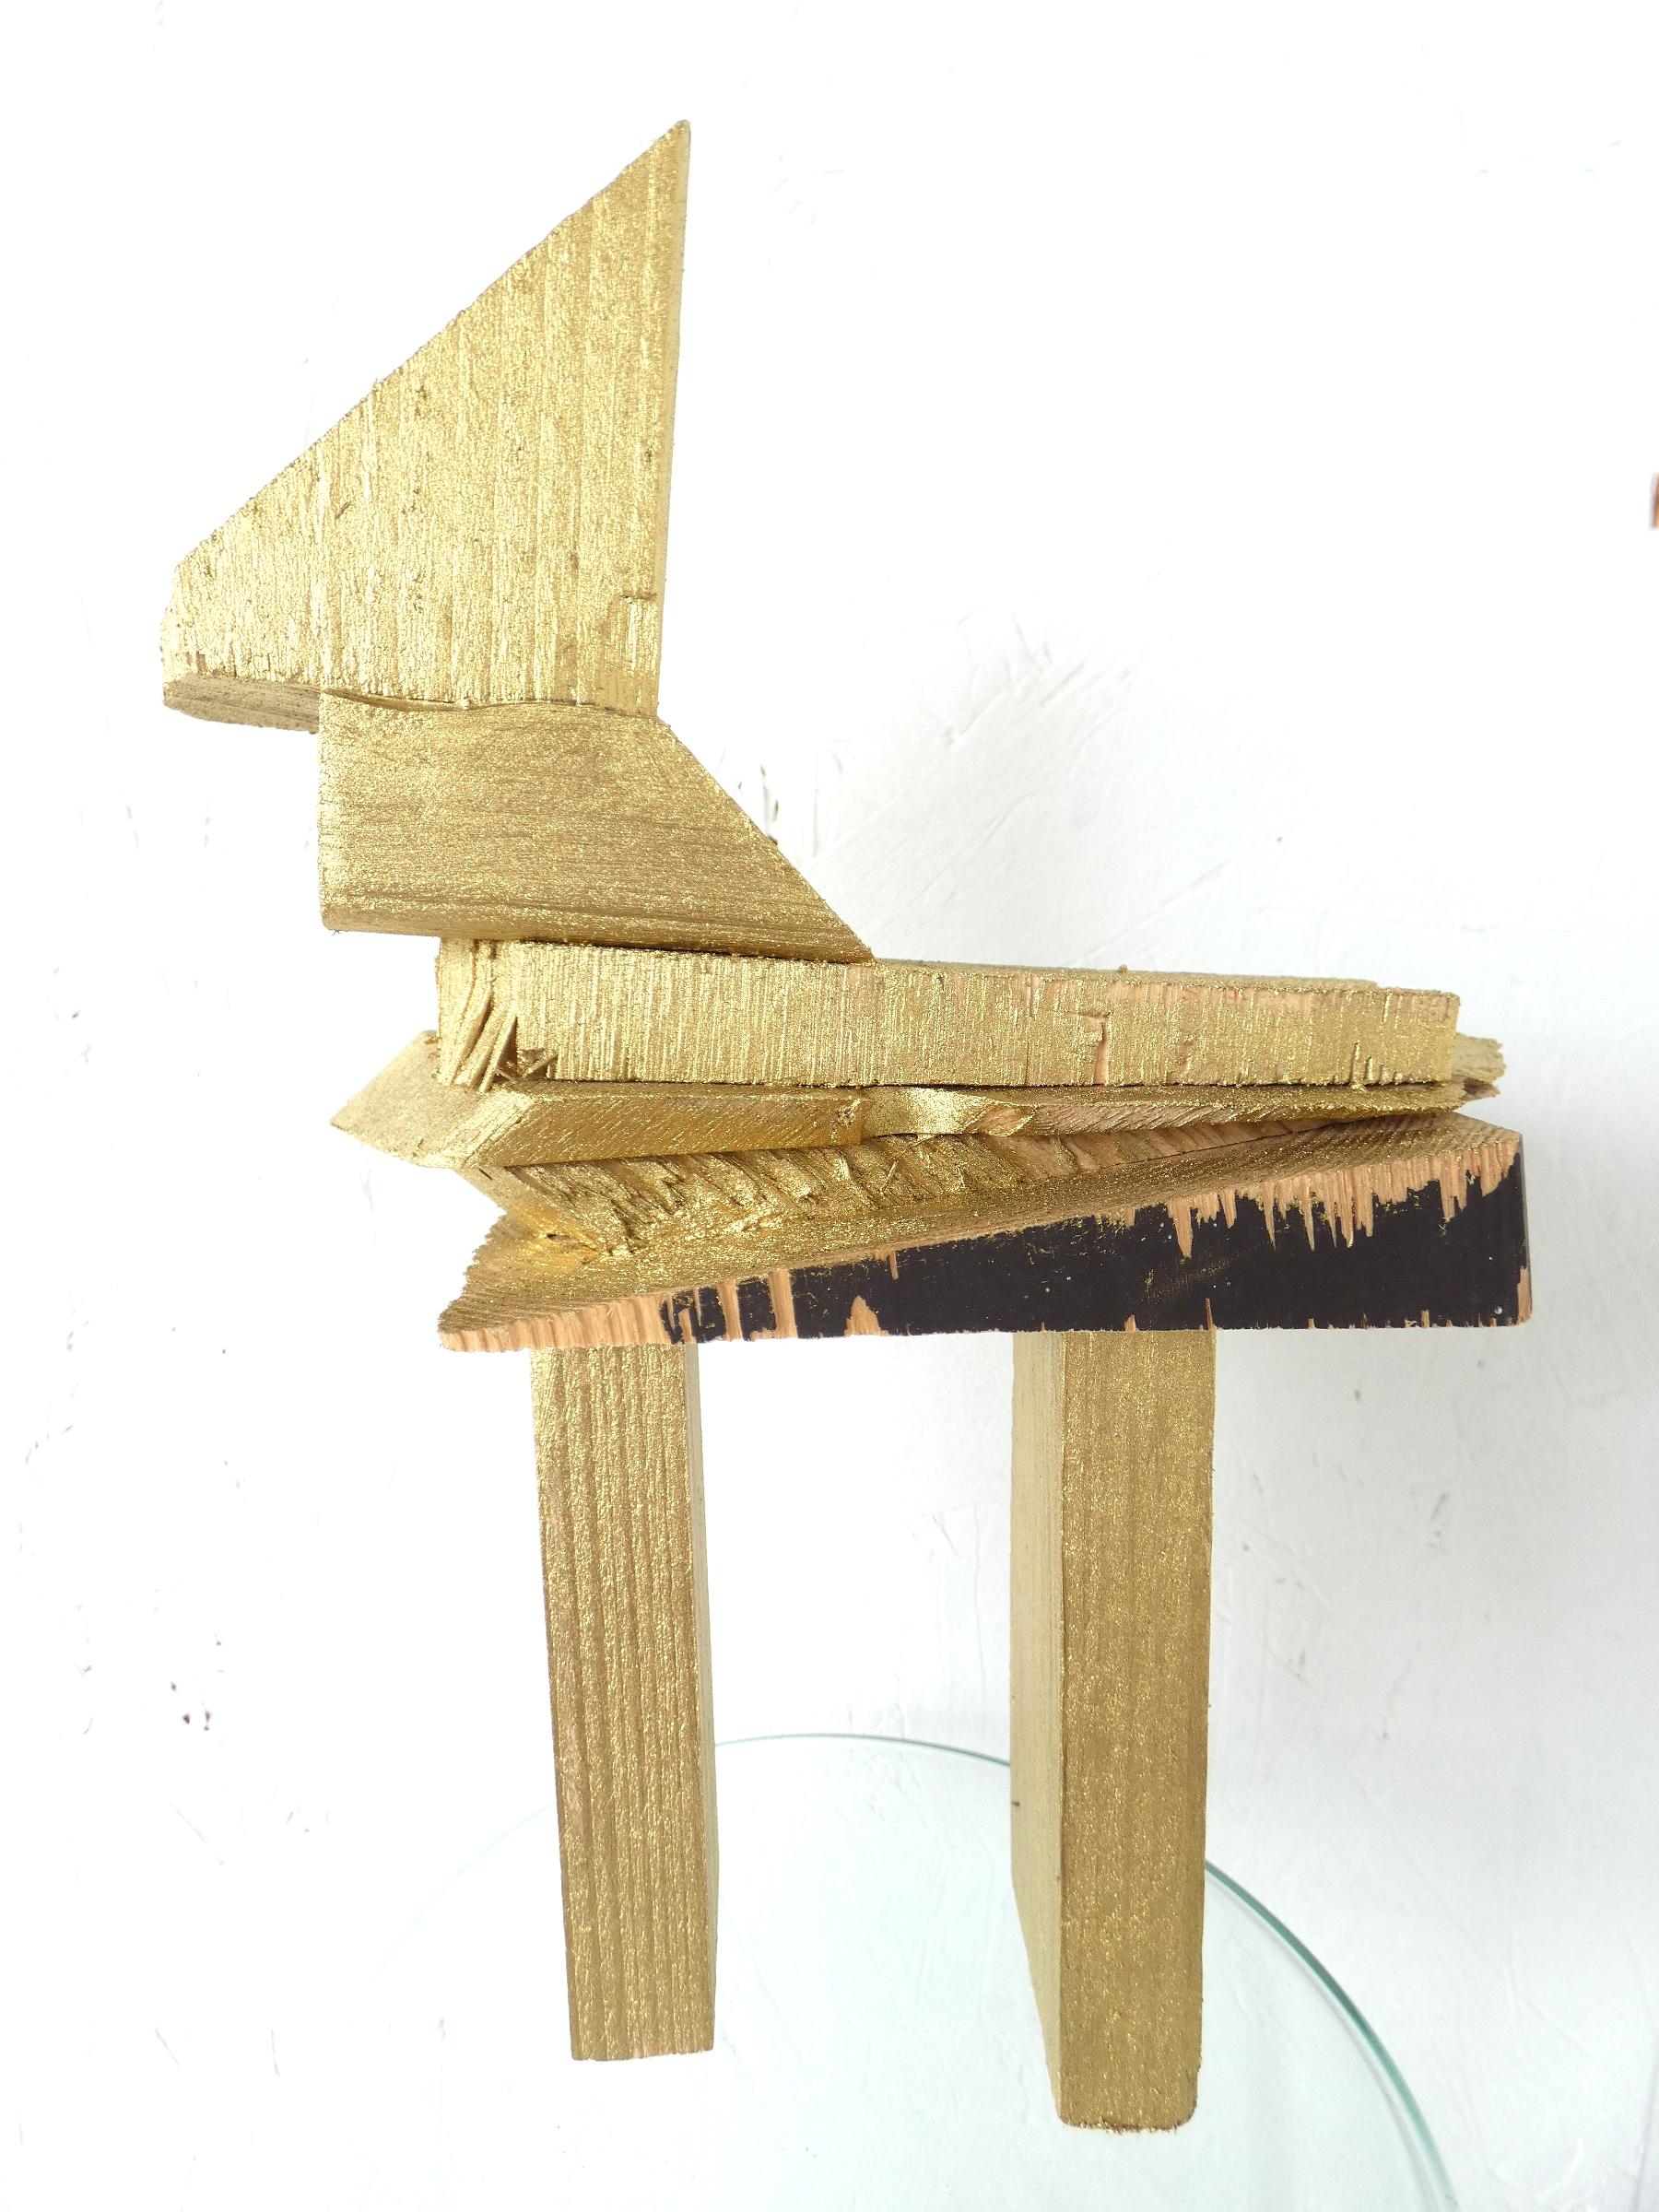 Bling bling paardje kunstbeeld, horse, kunstbeeld, artwork, artlovers, hout, goud, kunst kopen, mixed media, sculptuur, kunstenaar Wietske Lycklama à Nijeholt